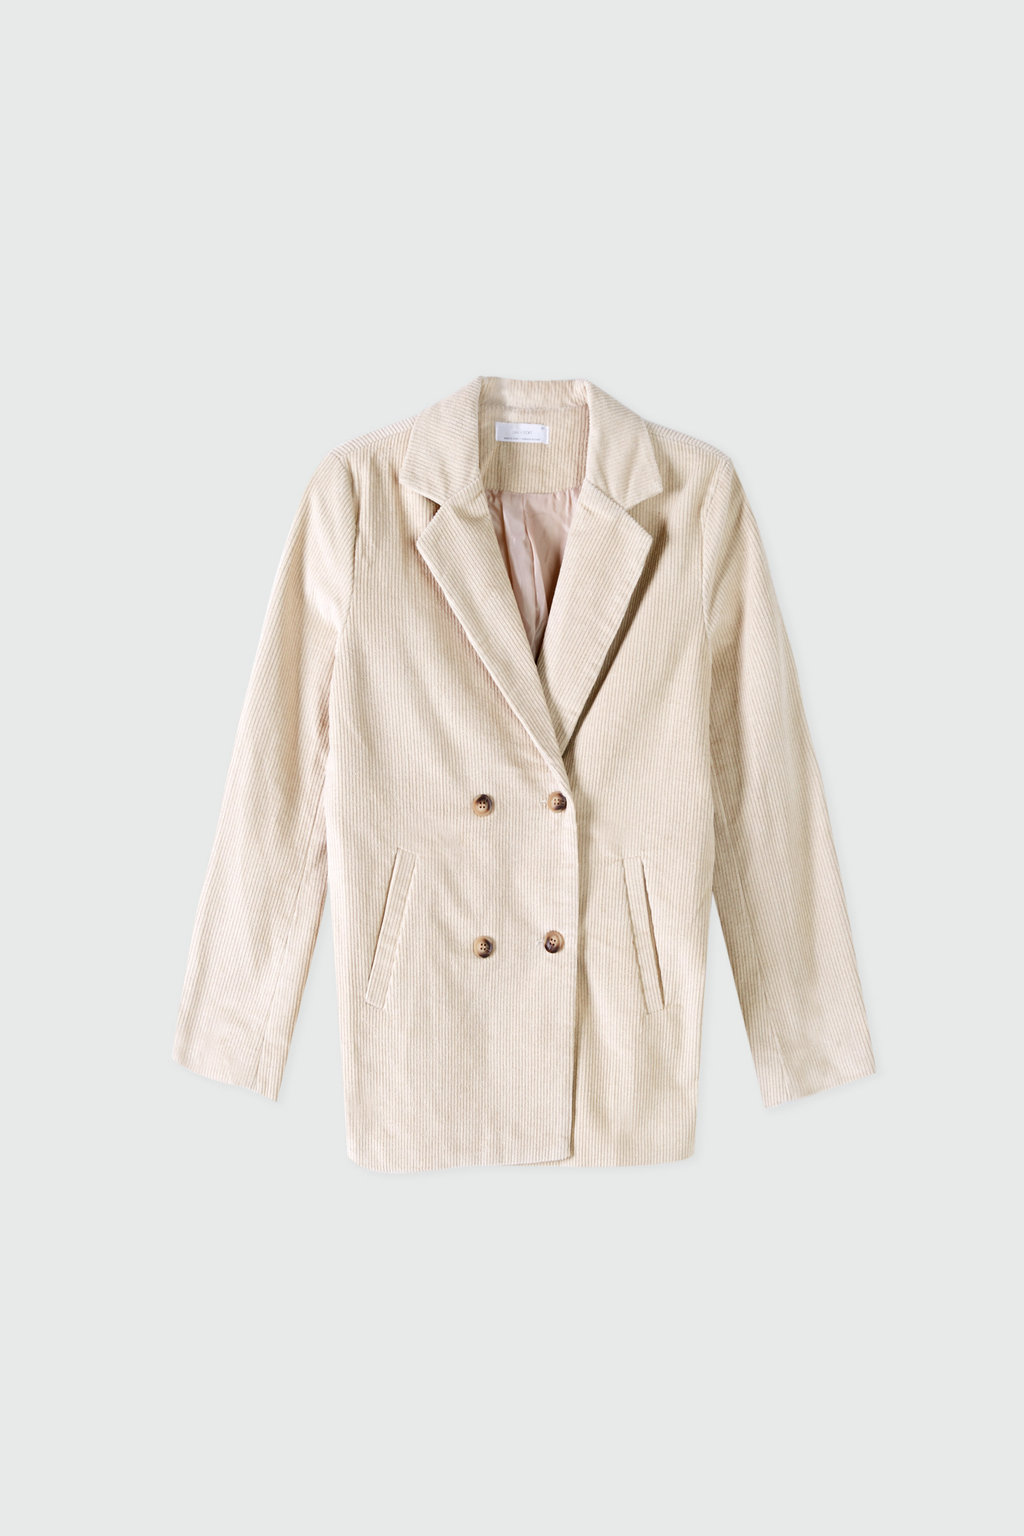 Jacket J005 Cream 7